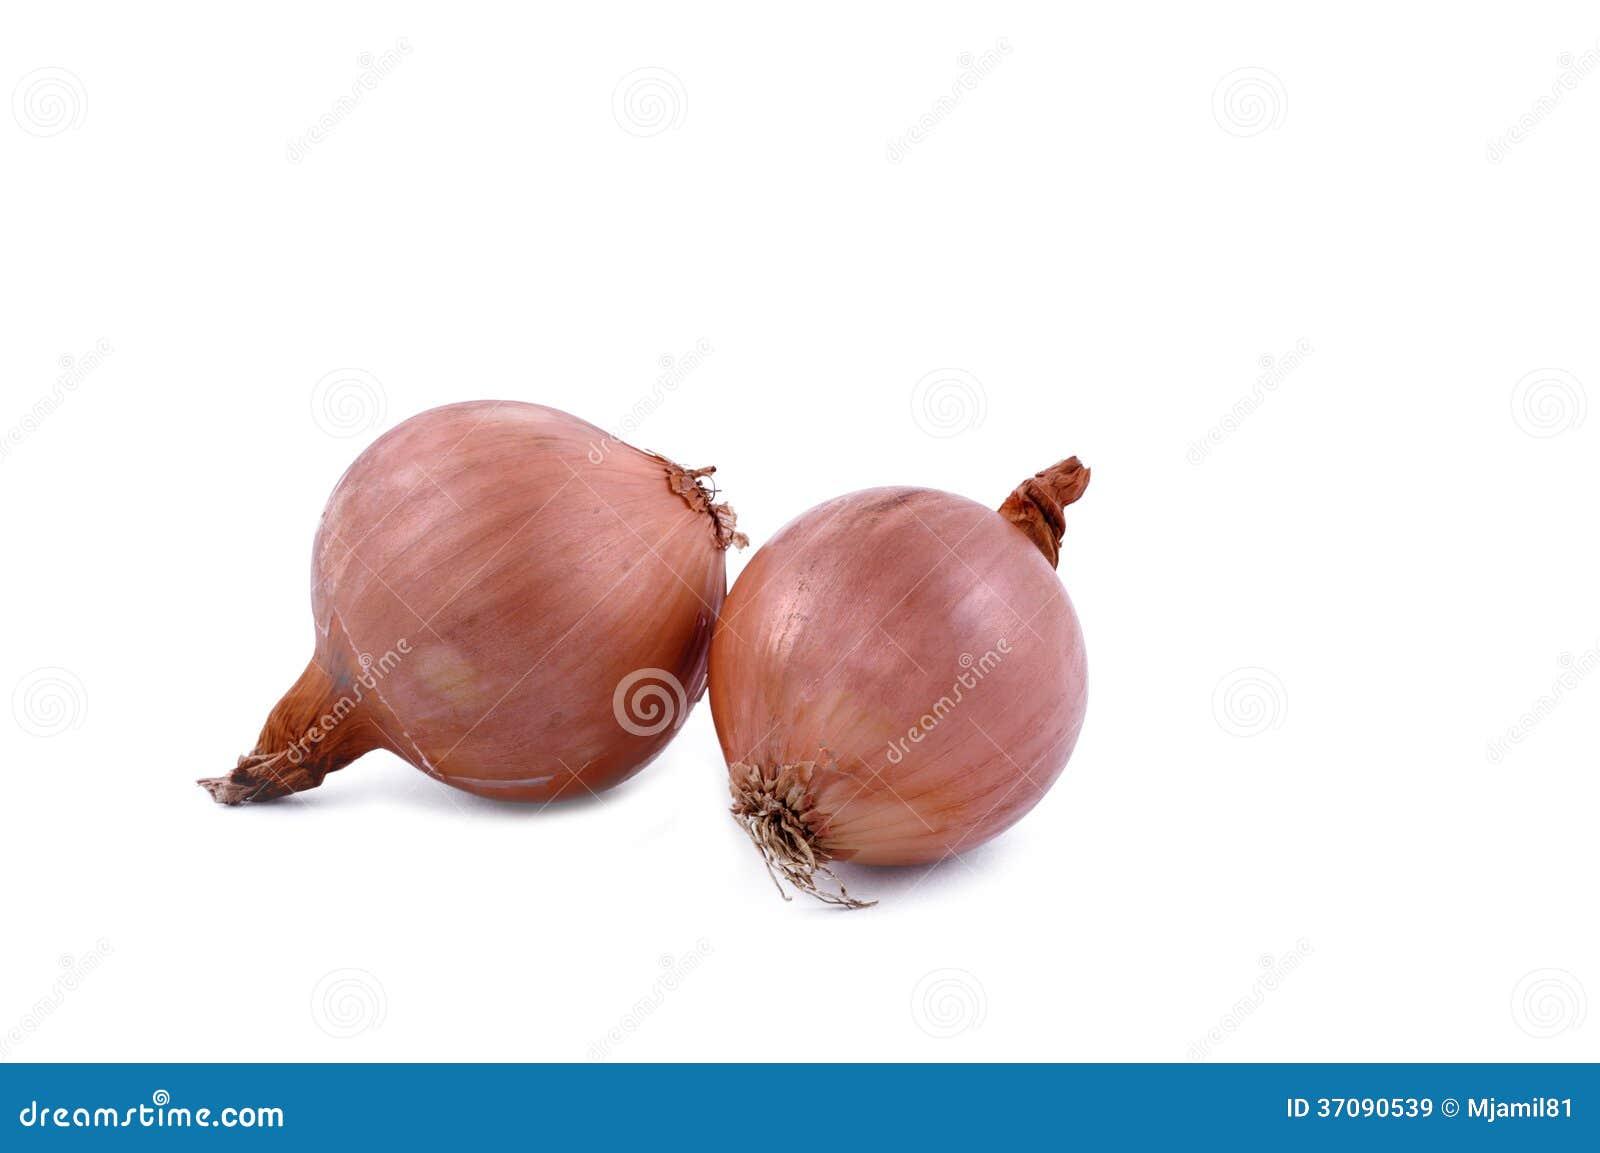 how to grow an onion from a bulb